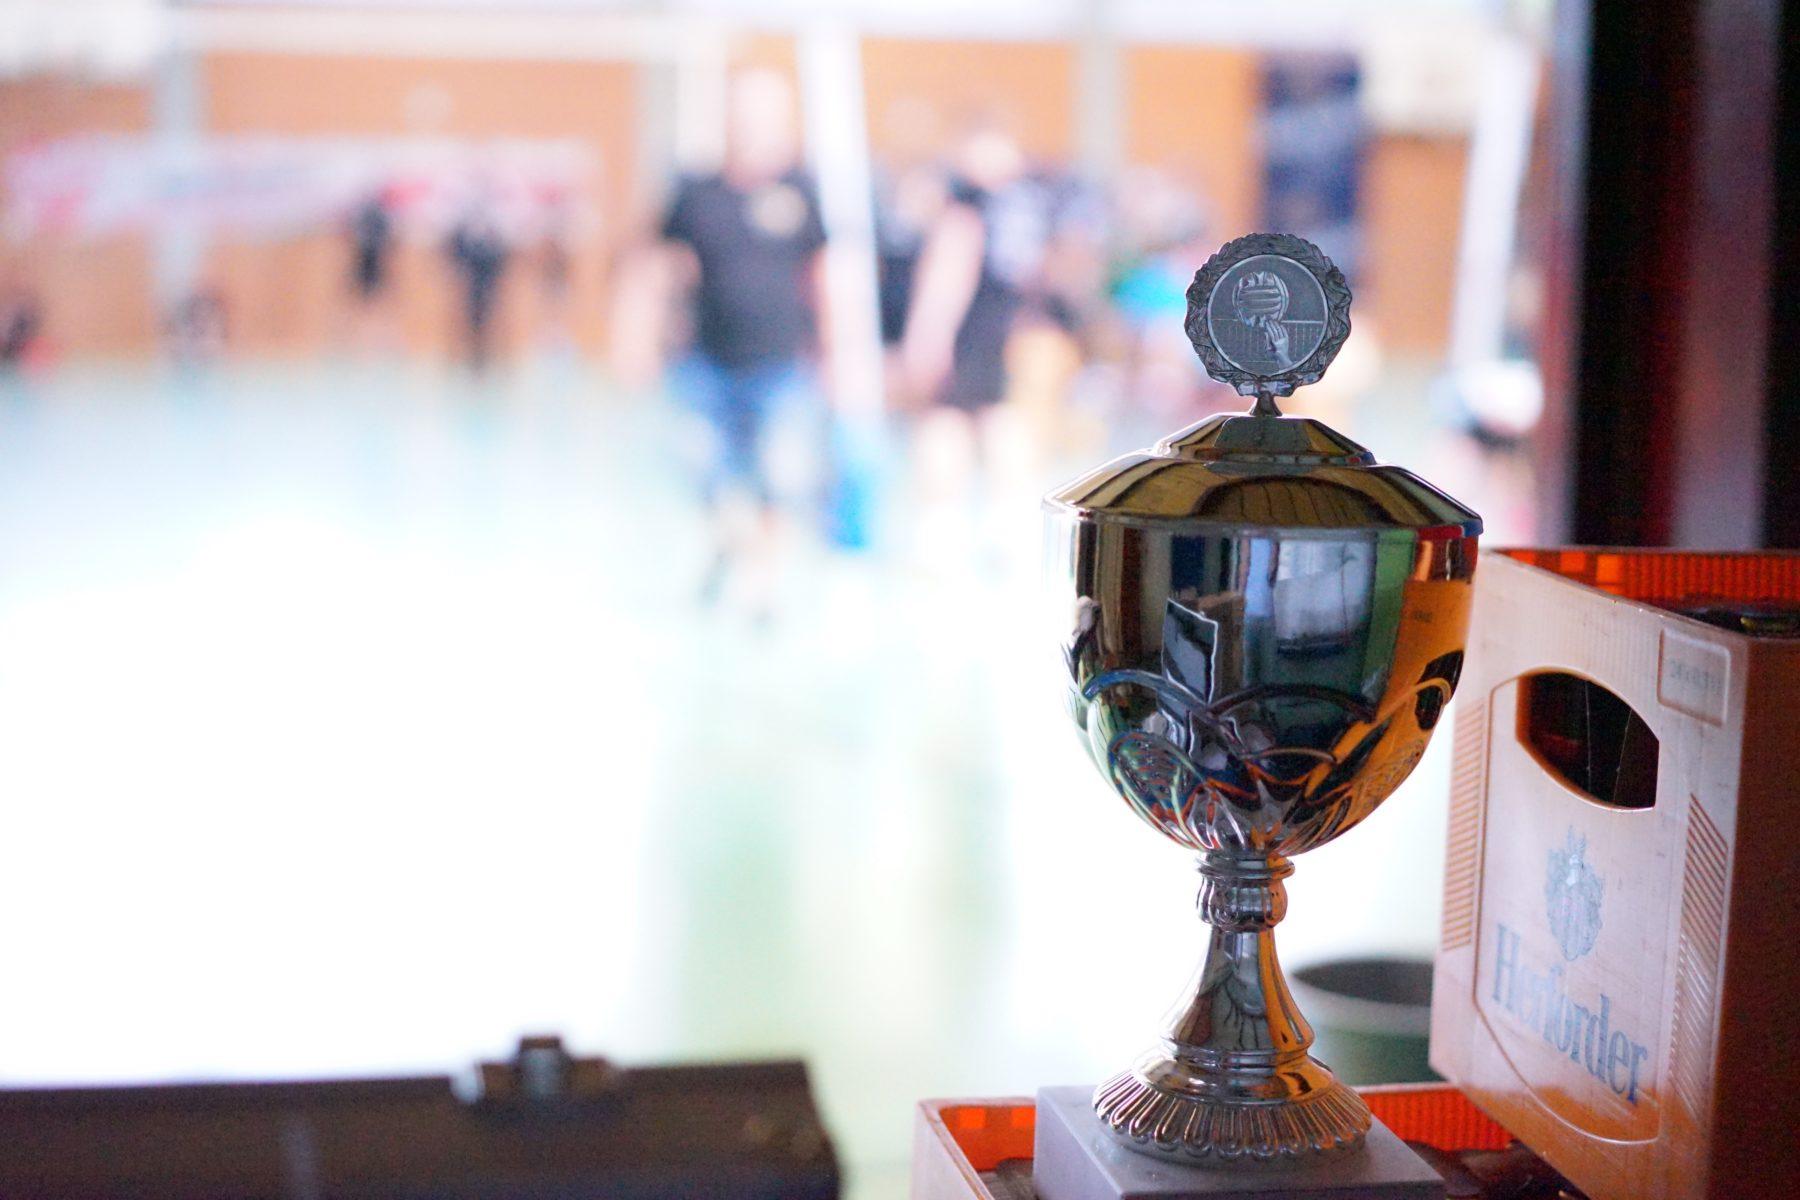 Bielefelder Cup